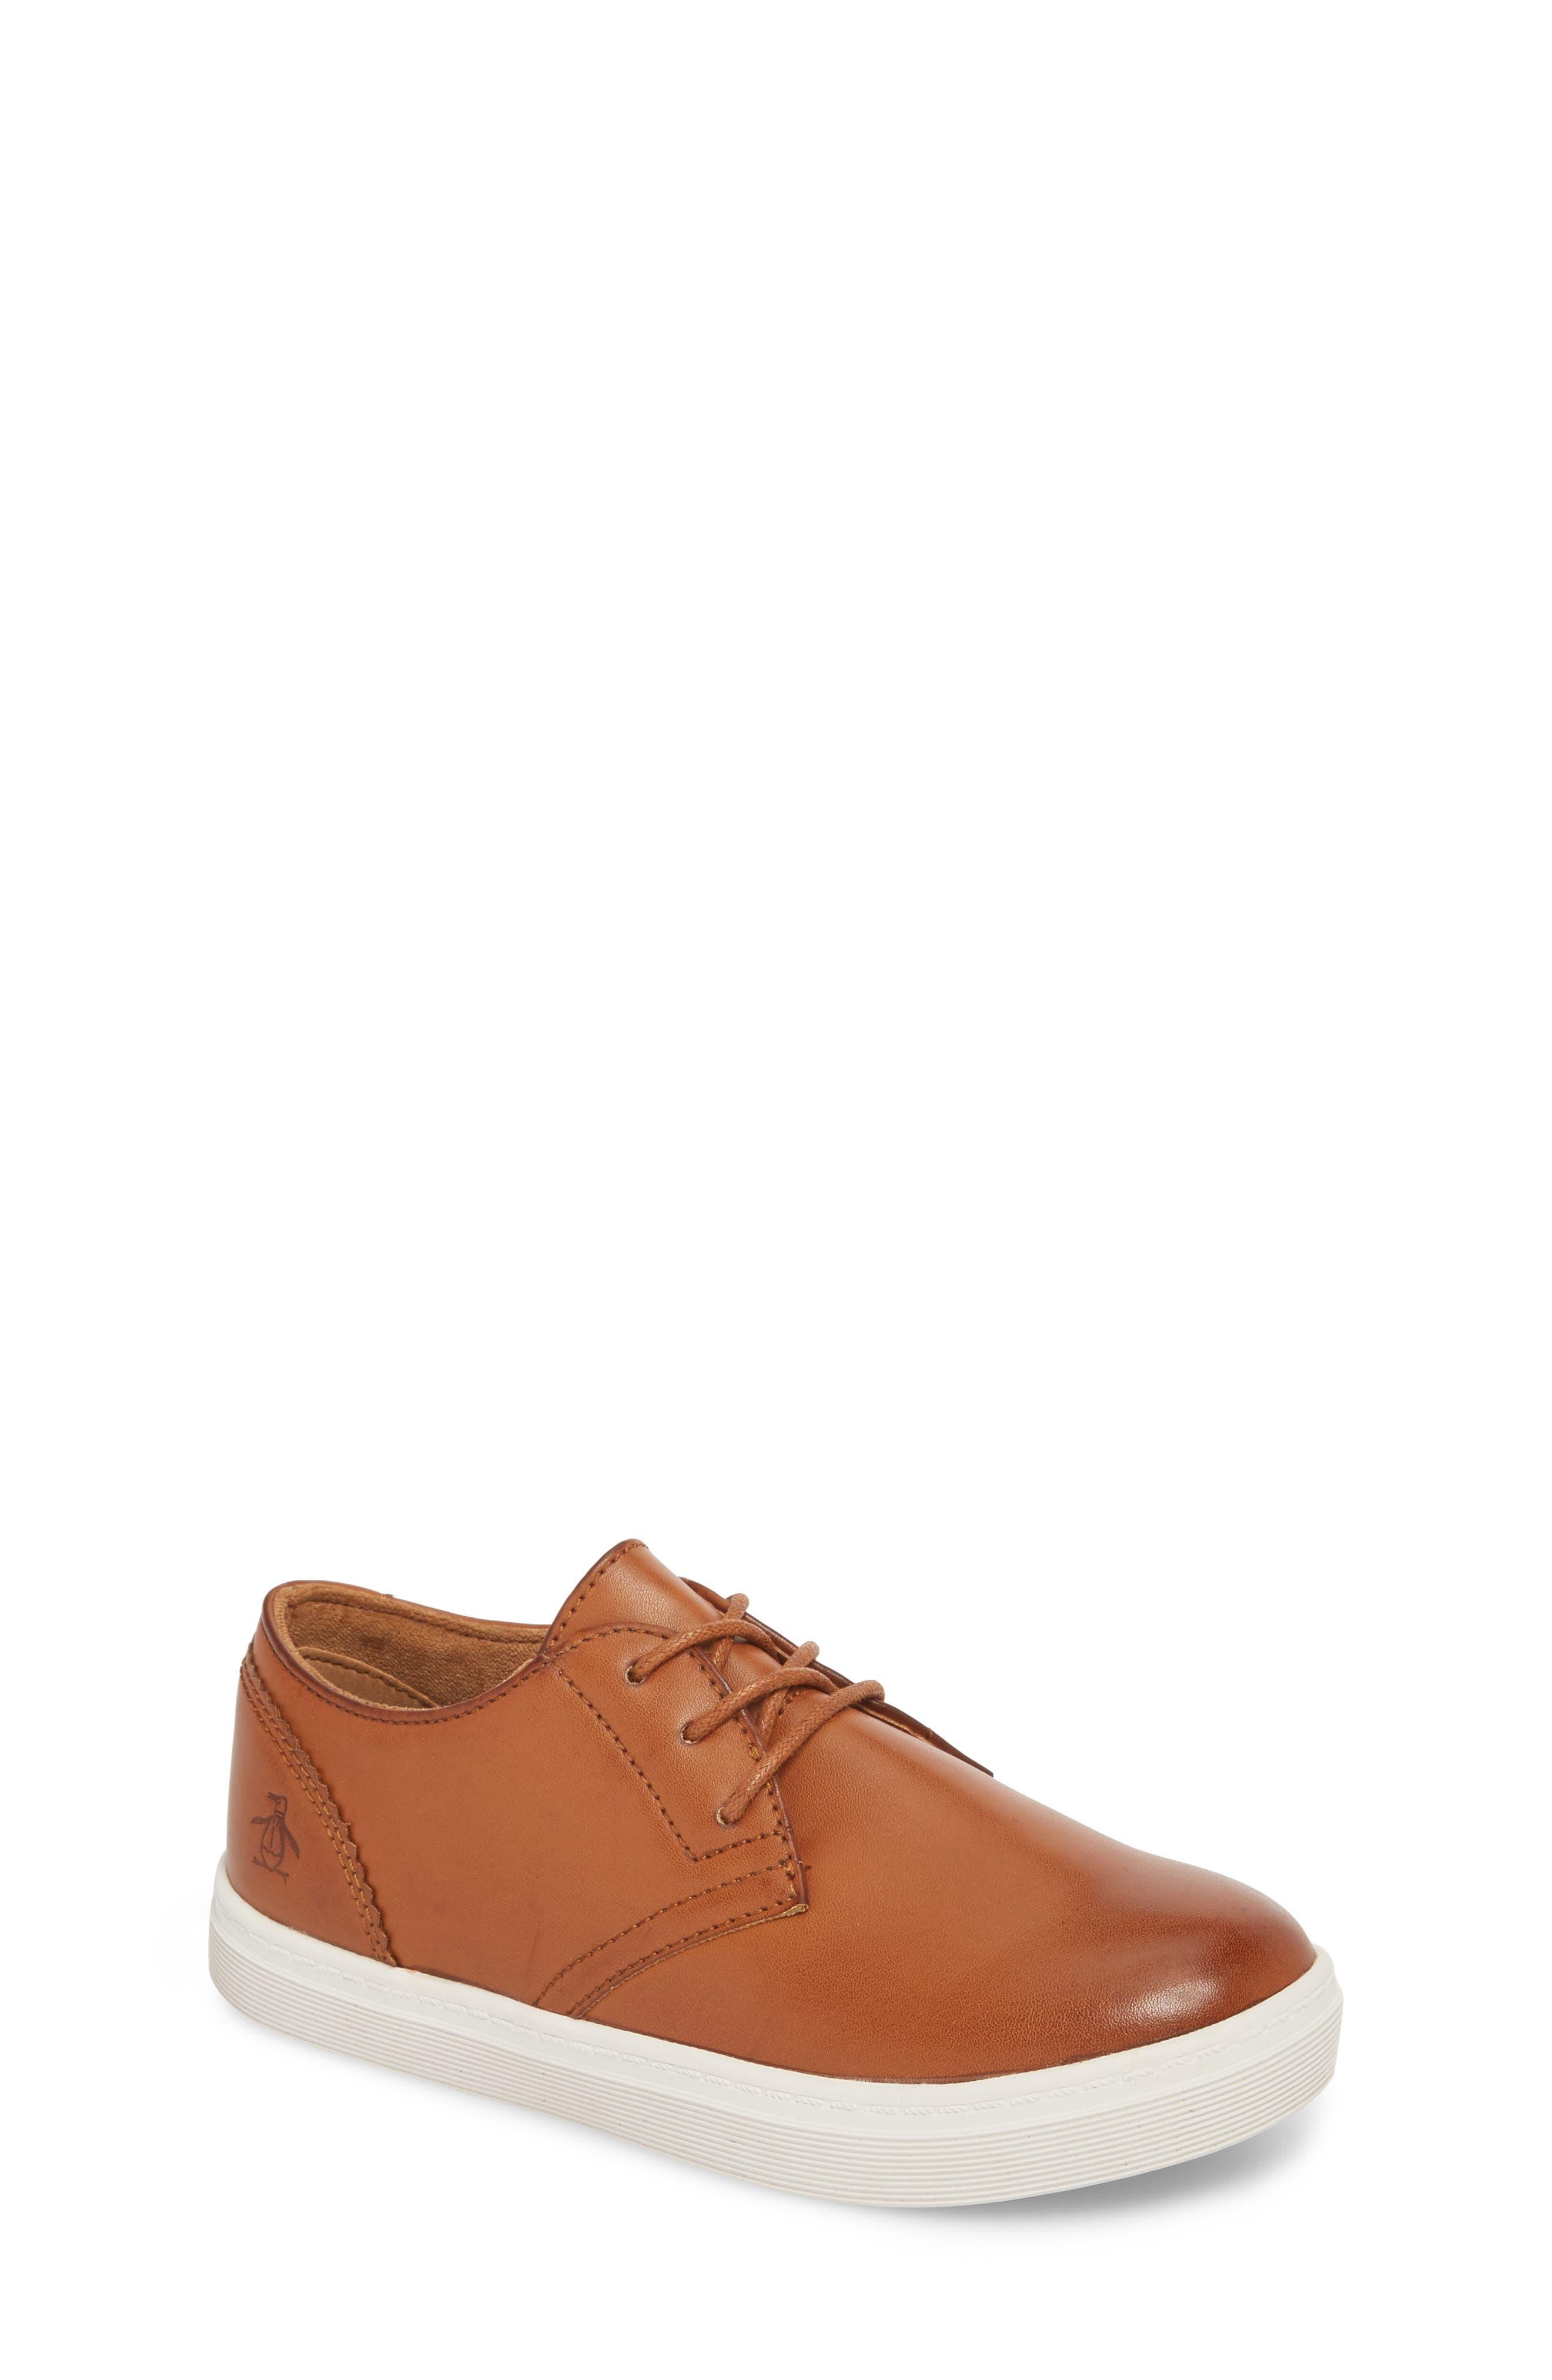 Freeland Sneaker,                         Main,                         color, COGNAC